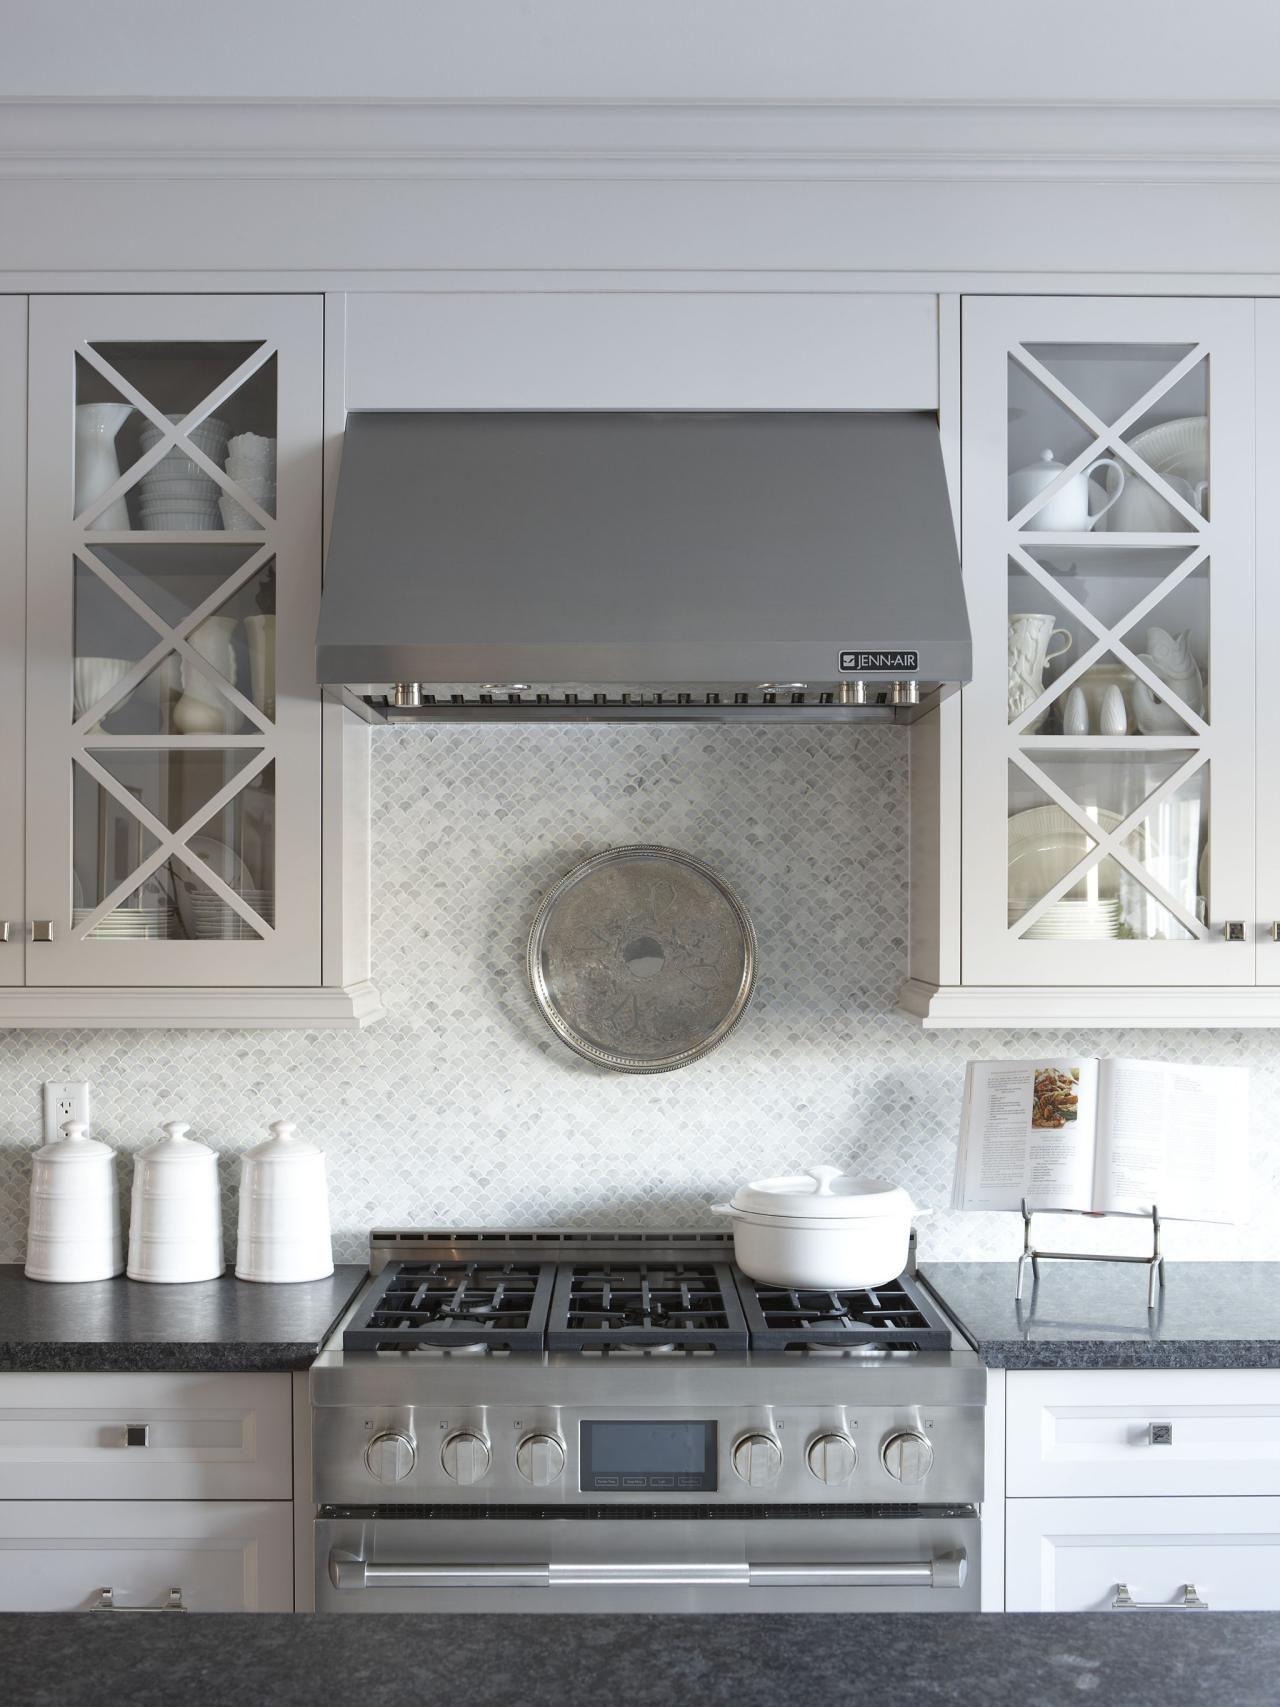 Pictures of kitchen backsplash ideas from pinterest mosaic